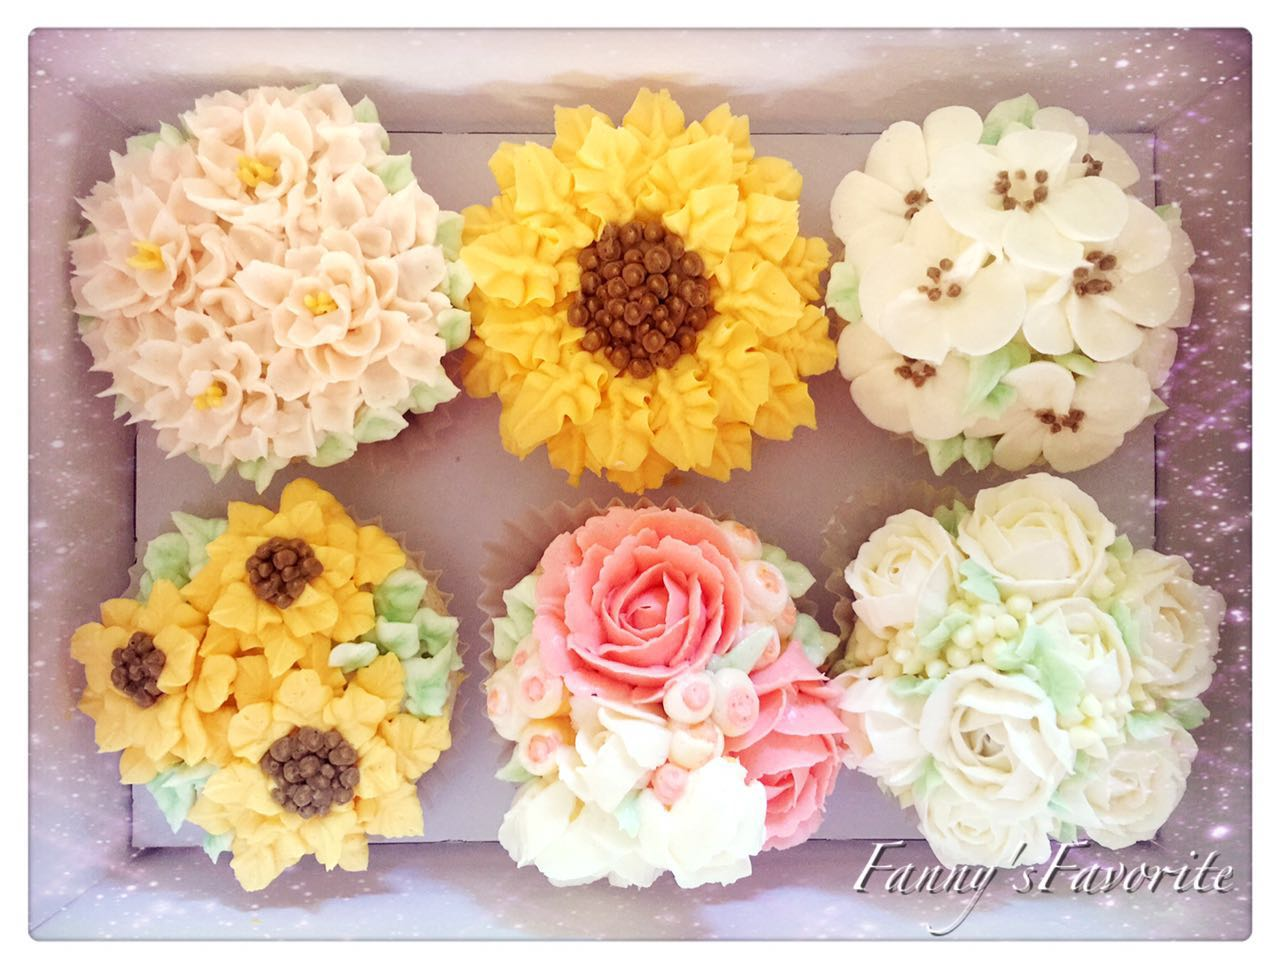 Cupcake flower deluxe buttercream fannys favorite cupcakedeluxe20151017003 izmirmasajfo